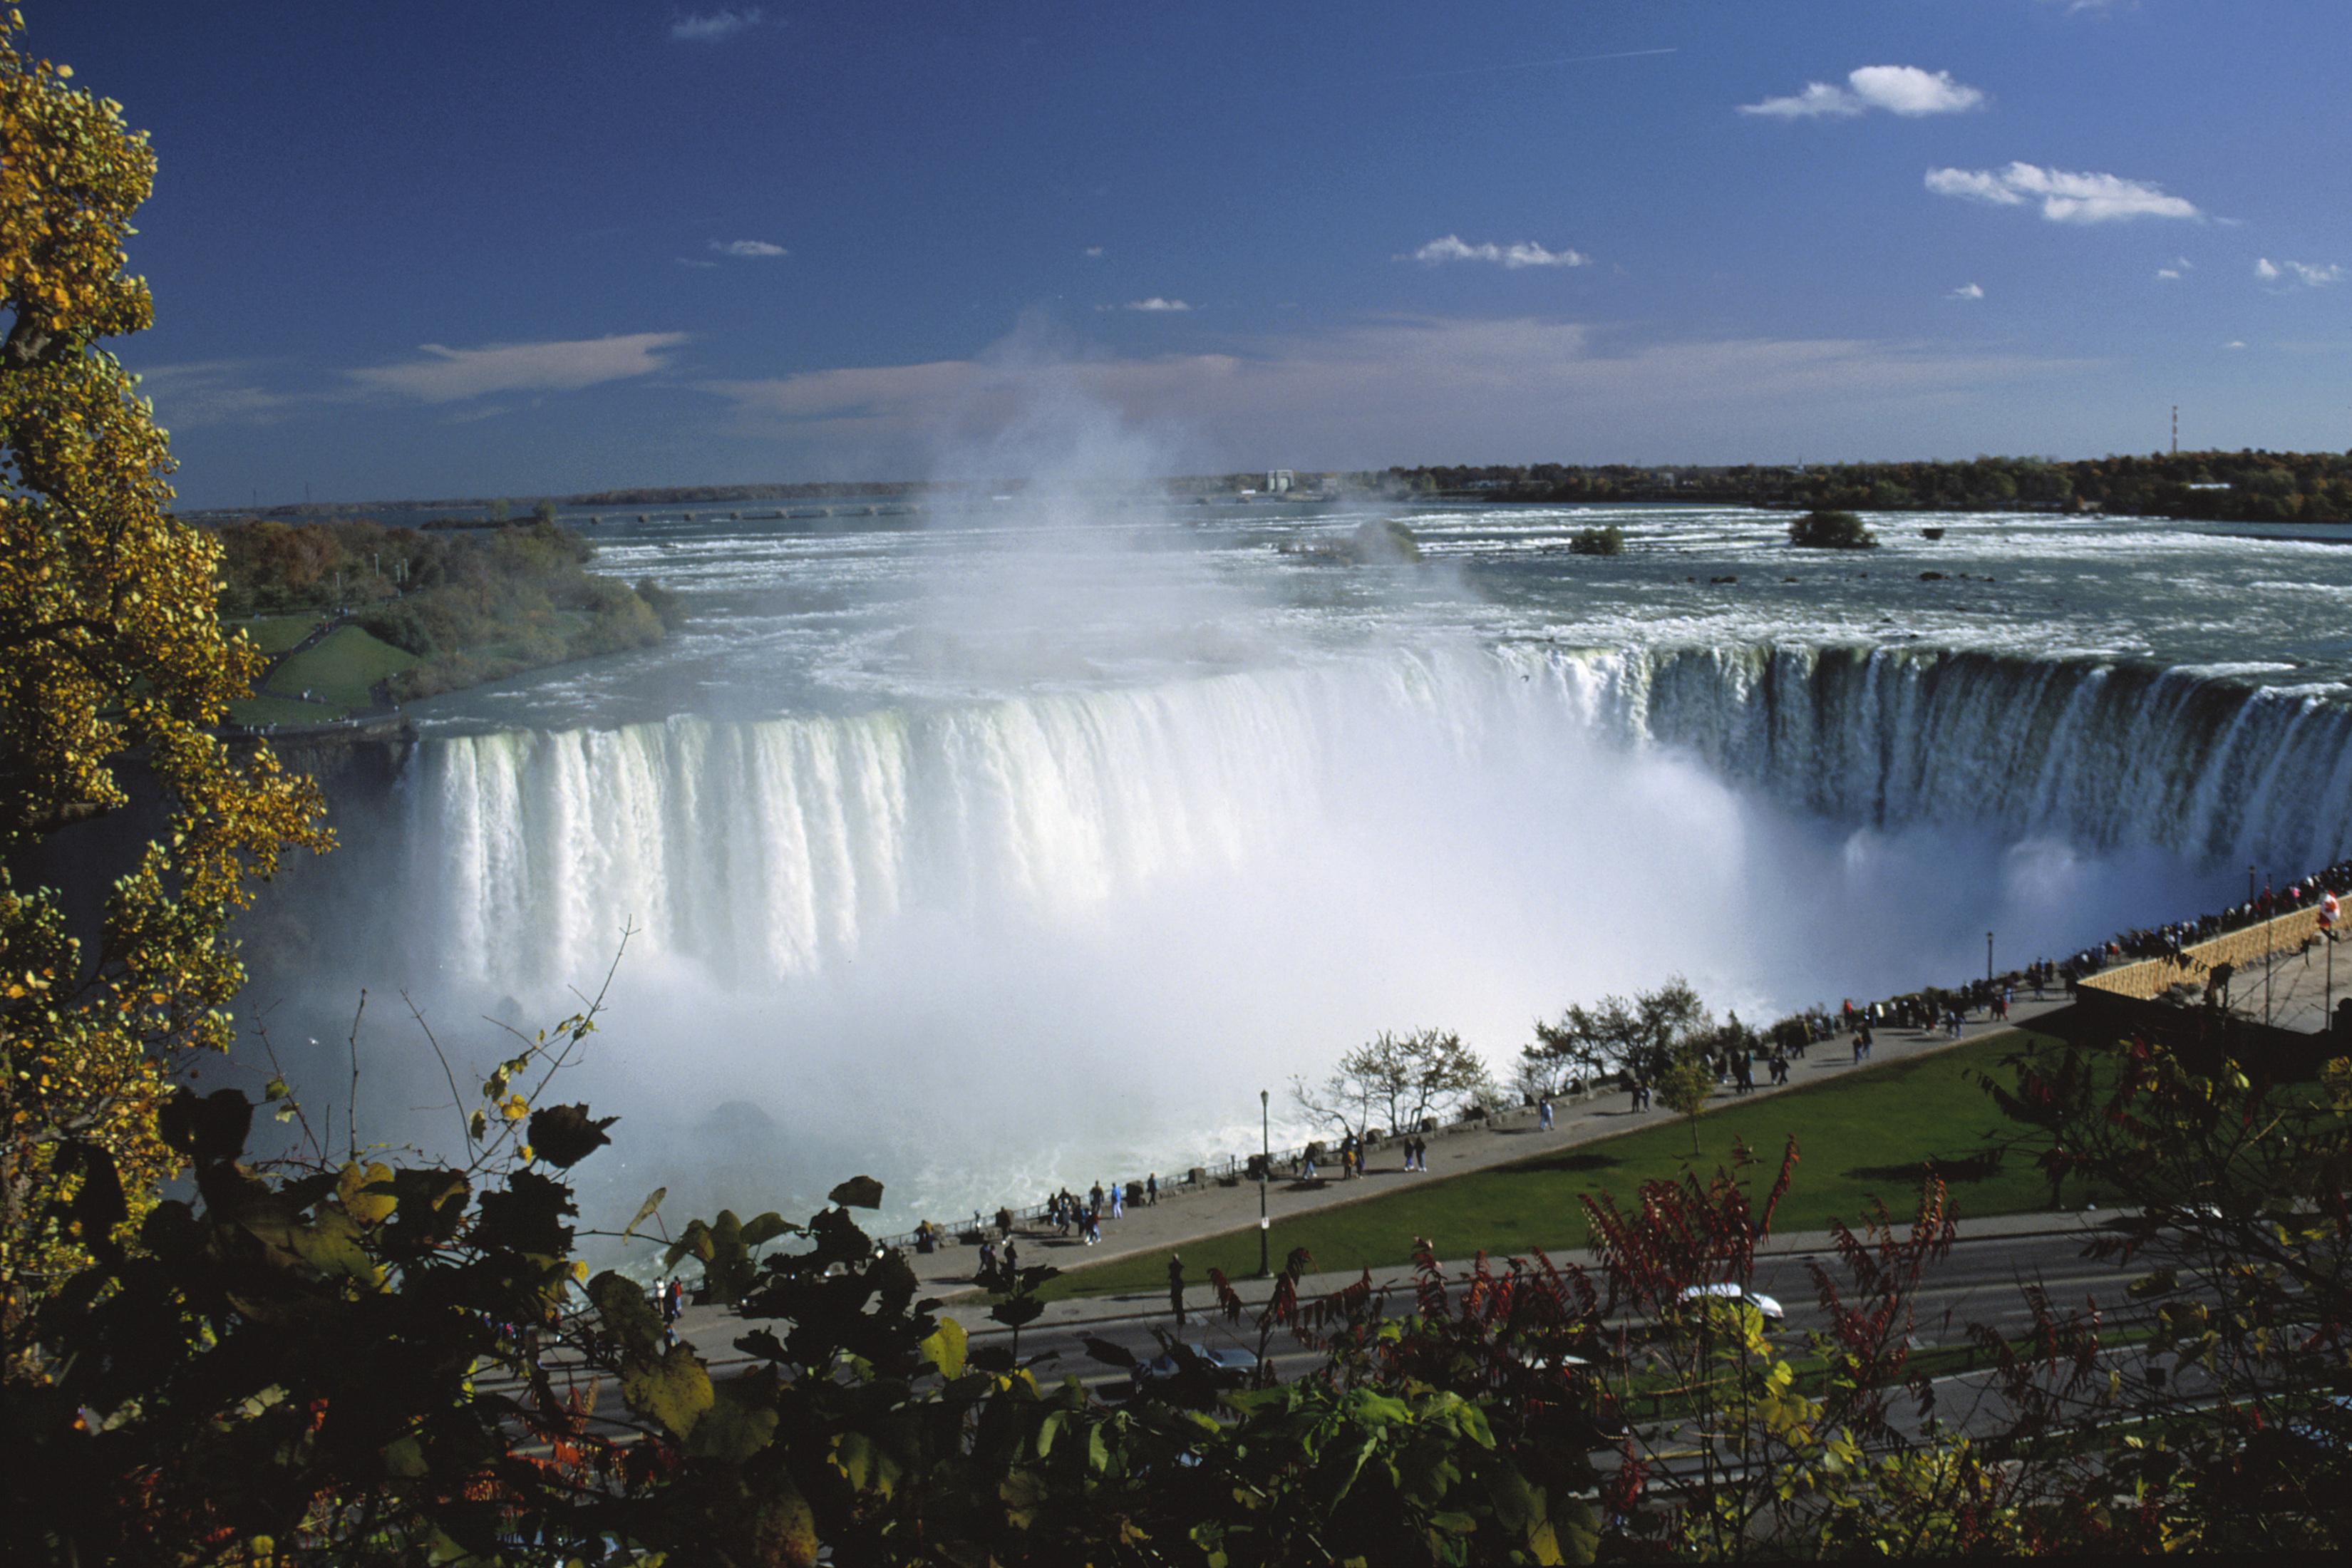 Waterfalls In Canada Near The Michigan Border